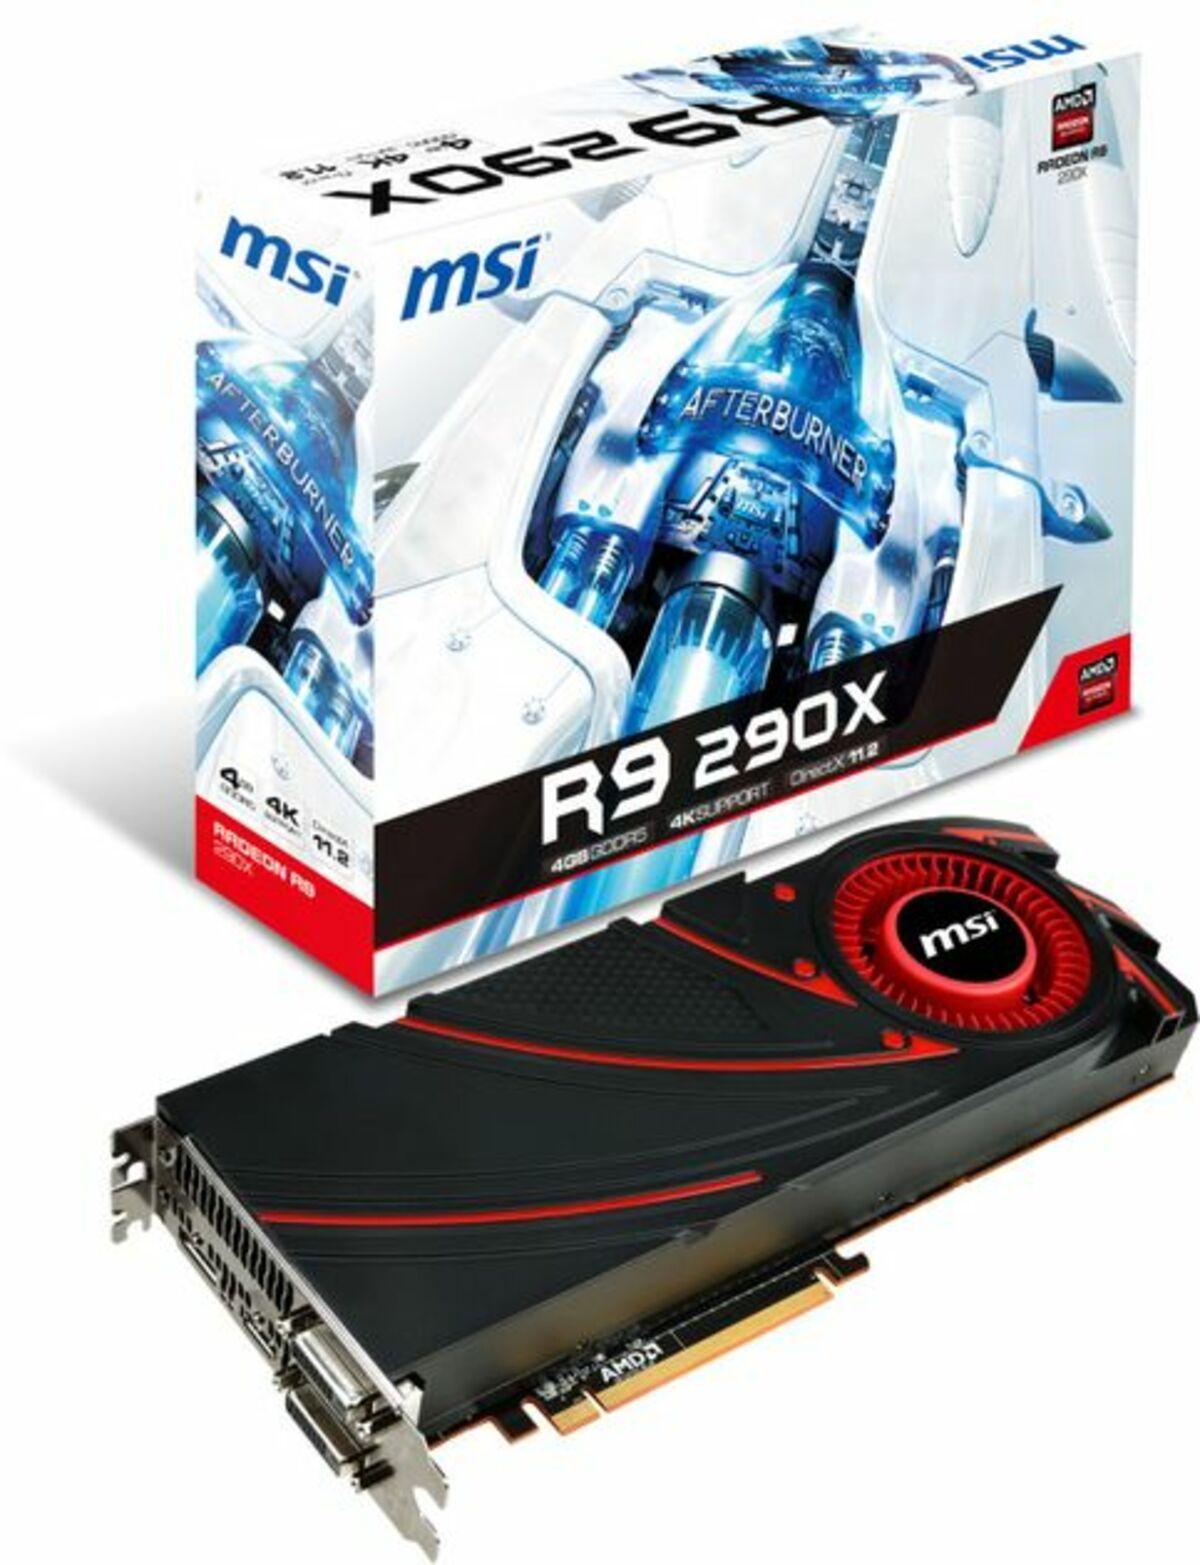 AMD Radeon R9 290X Caja 05 4